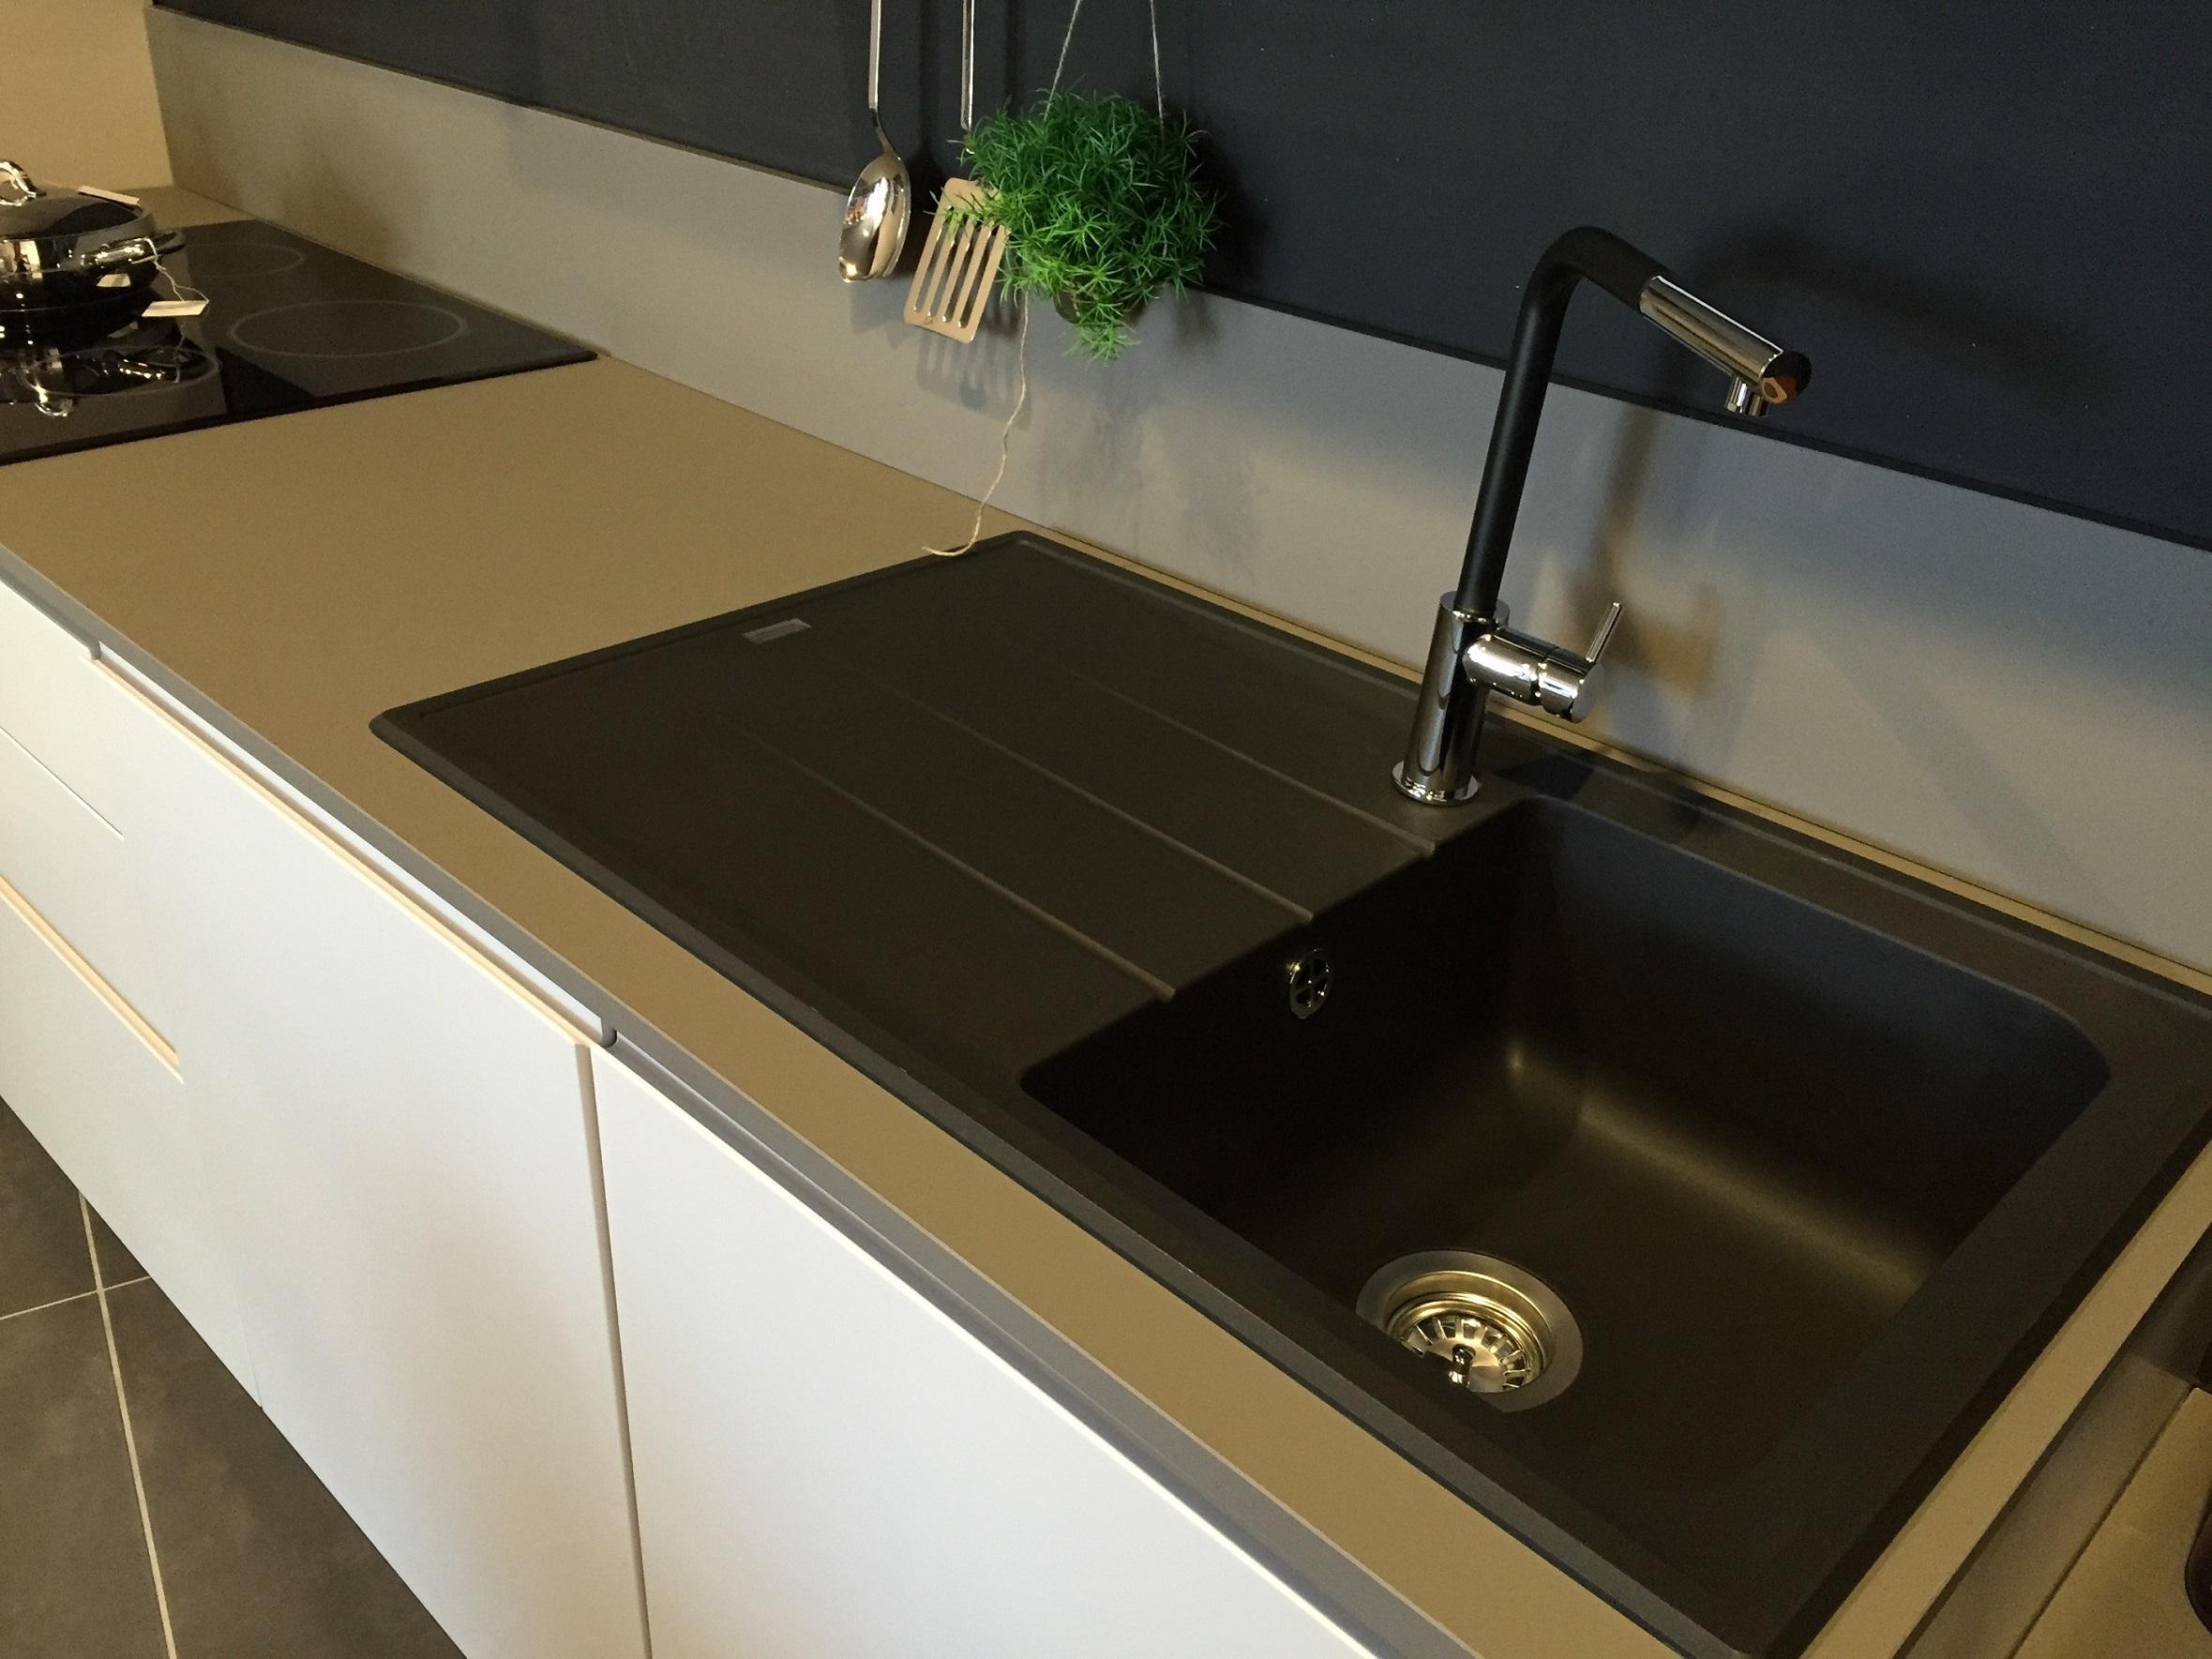 Artre cucina flo moderna laccato opaco cucine a prezzi - Lavello cucina resina ...